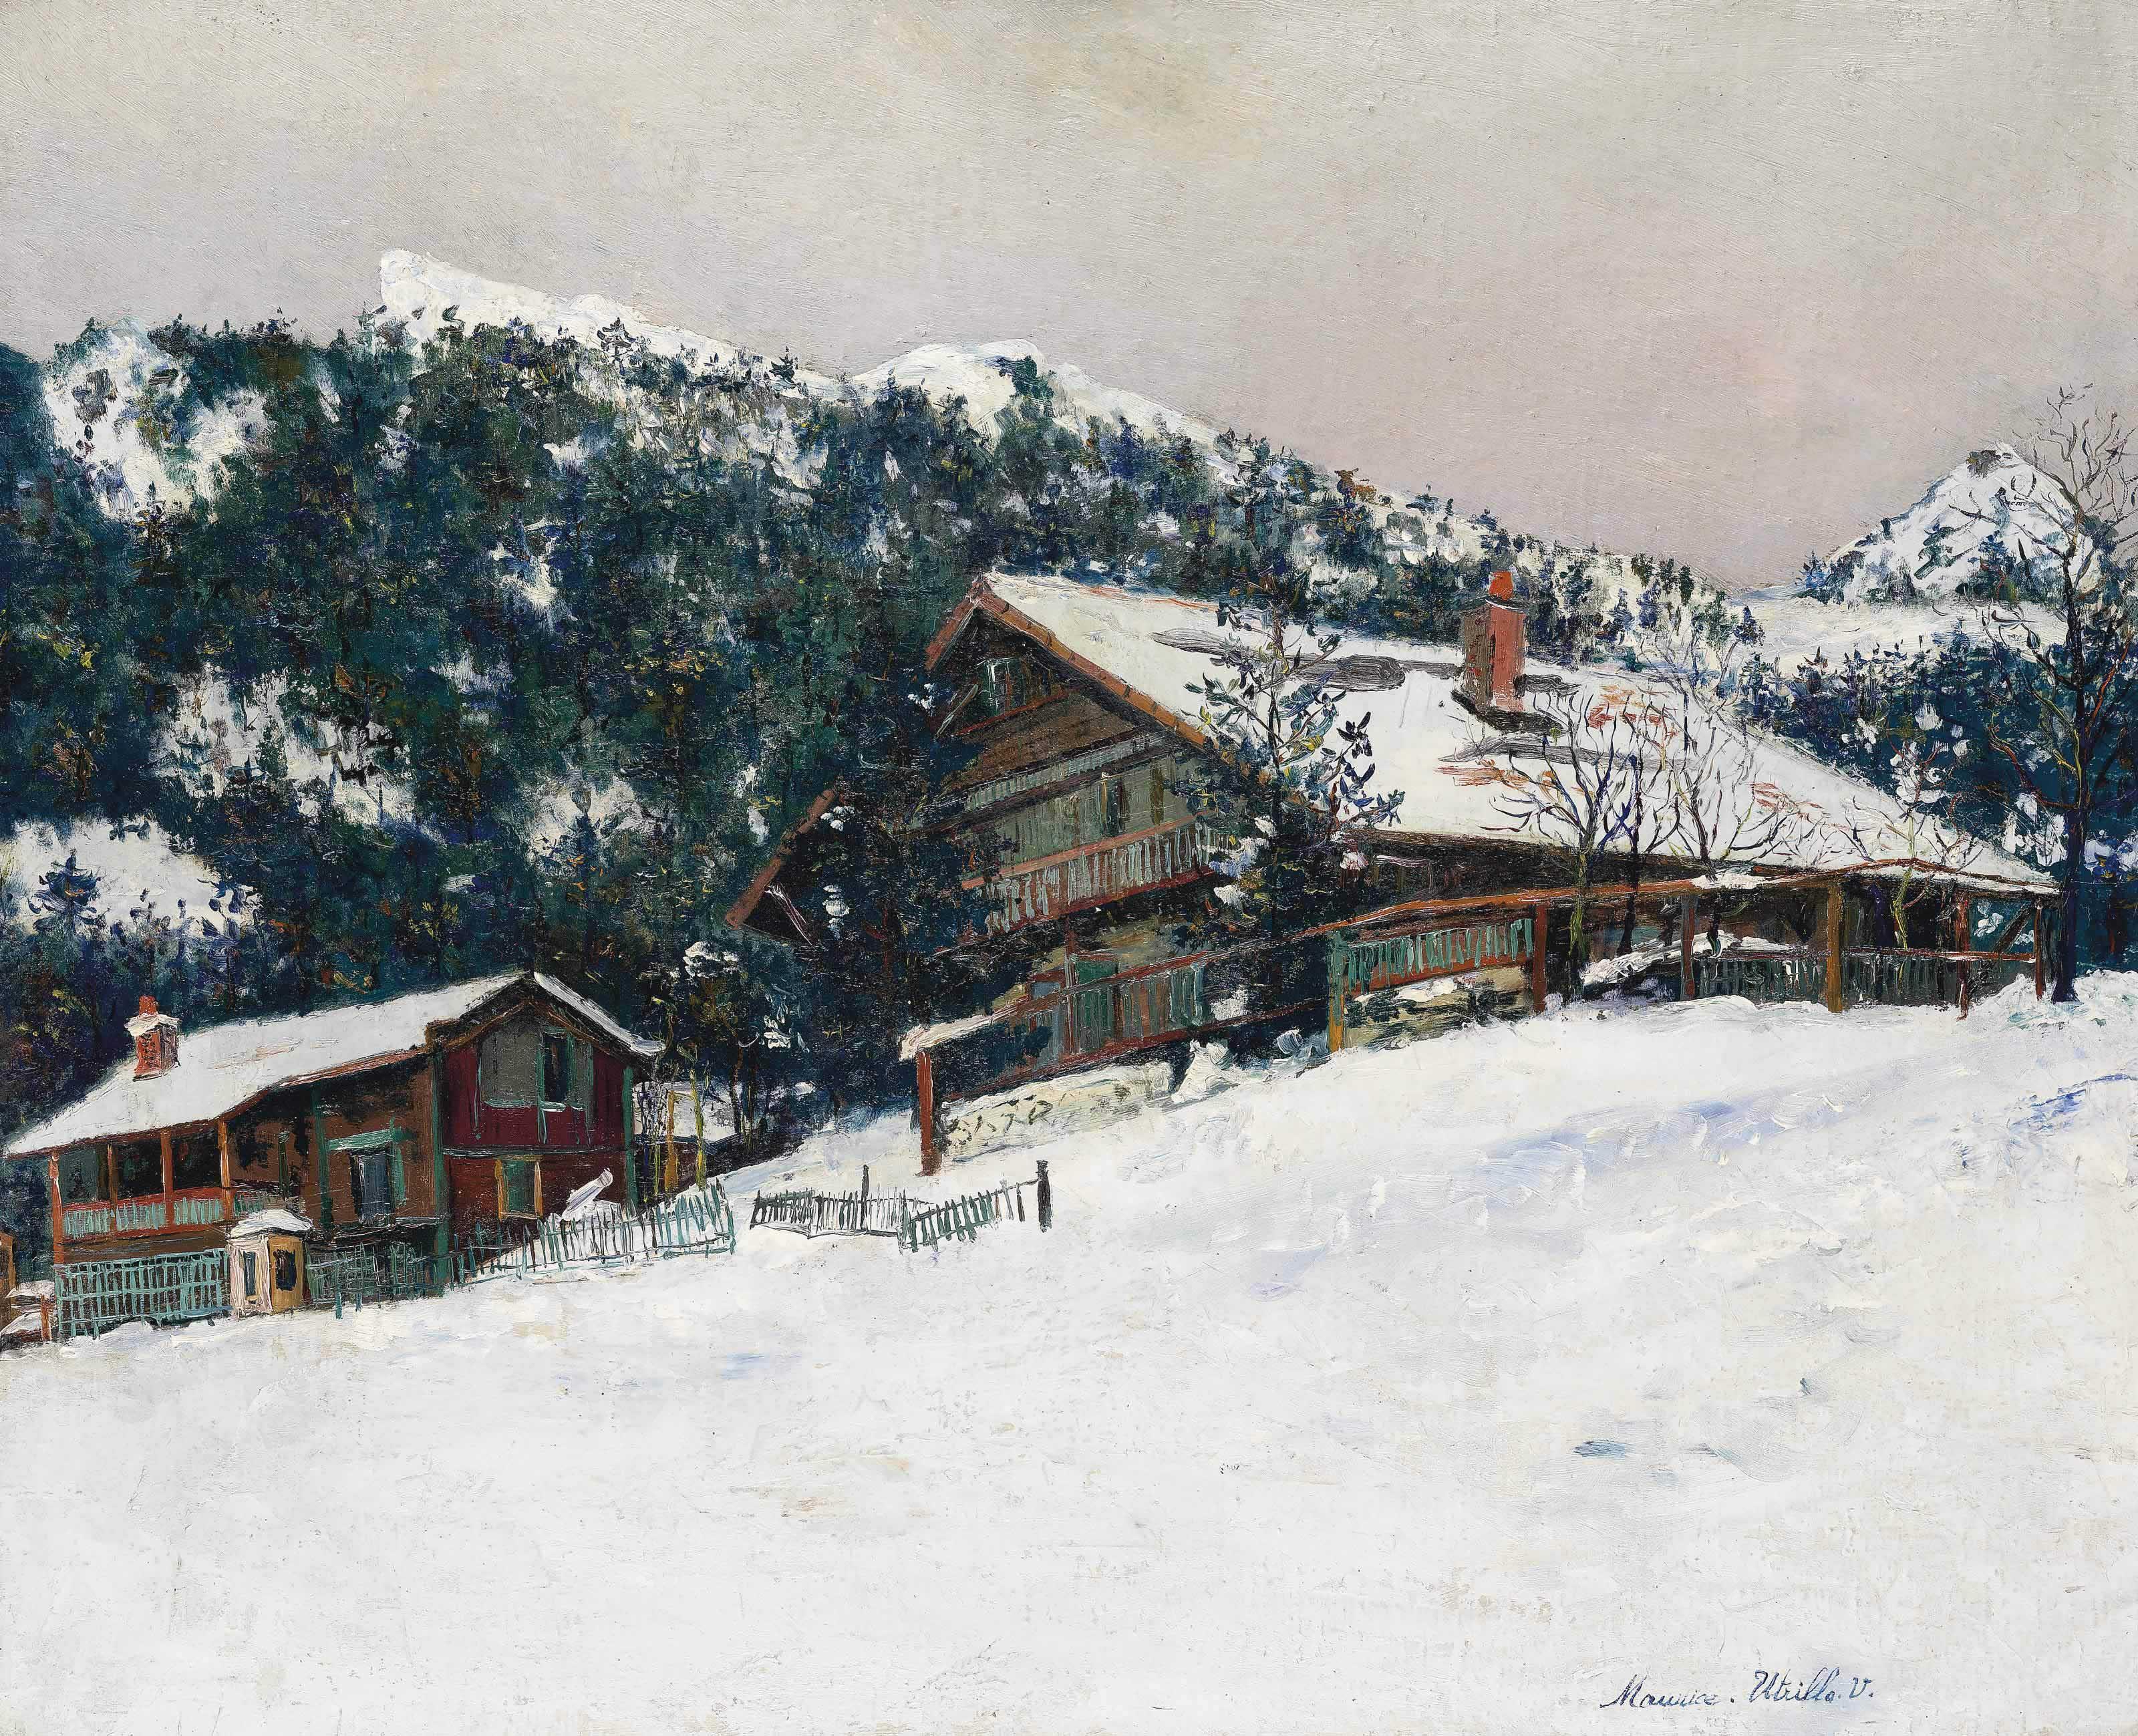 https://www.christies.com/img/LotImages/2011/NYR/2011_NYR_02479_0237_000(maurice_utrillo_paysage_de_neige_en_suisse).jpg